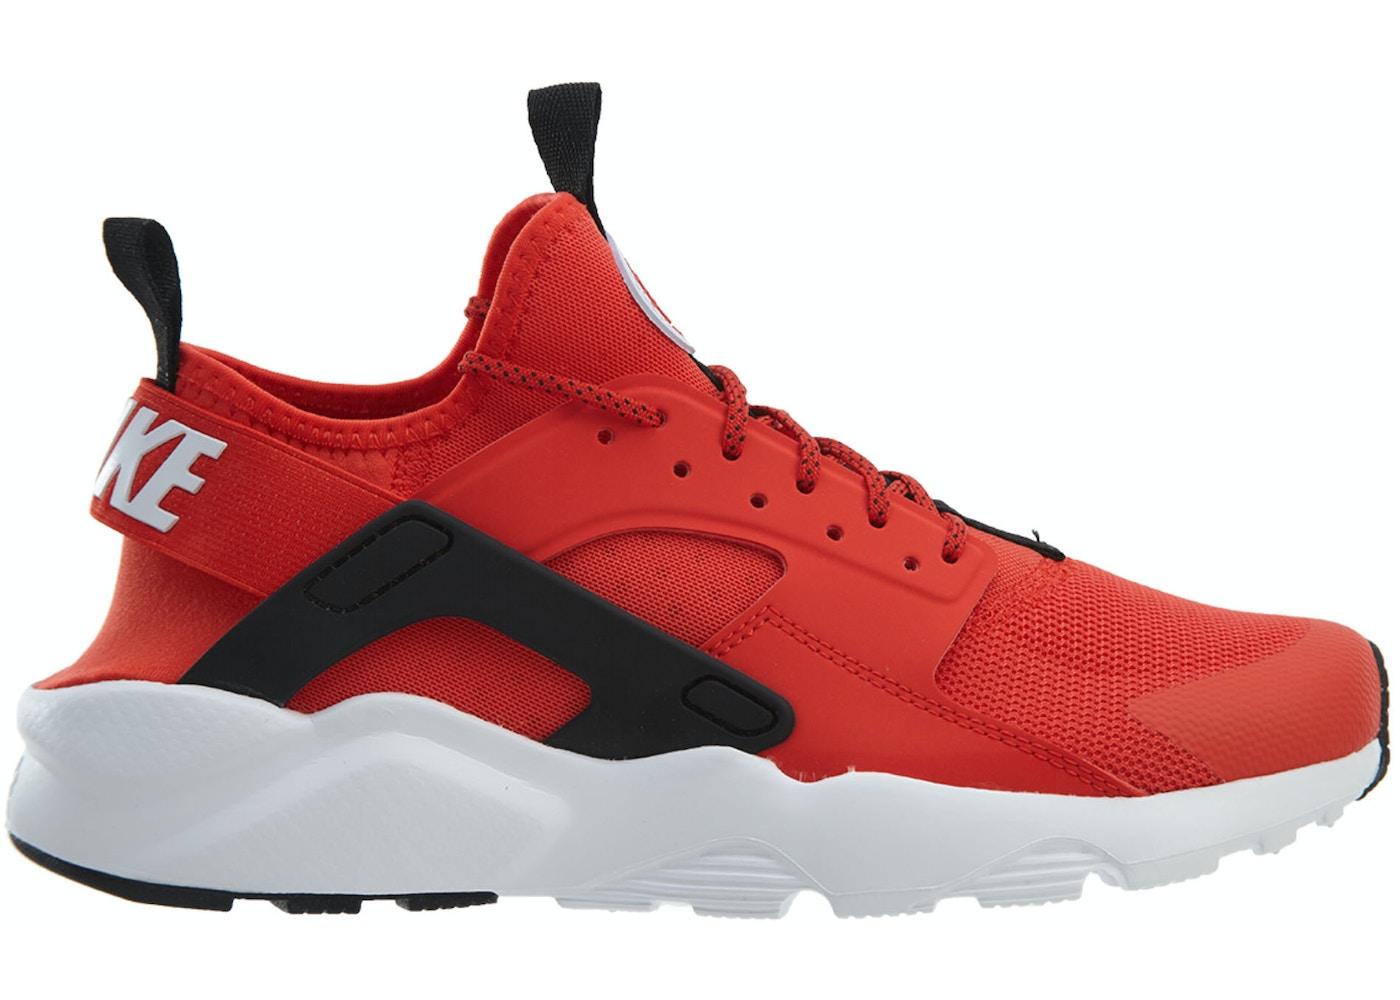 Dental grande Precursor  Nike Air Huarache Run Ultra Habanero Red White-White-Black - 819685-606